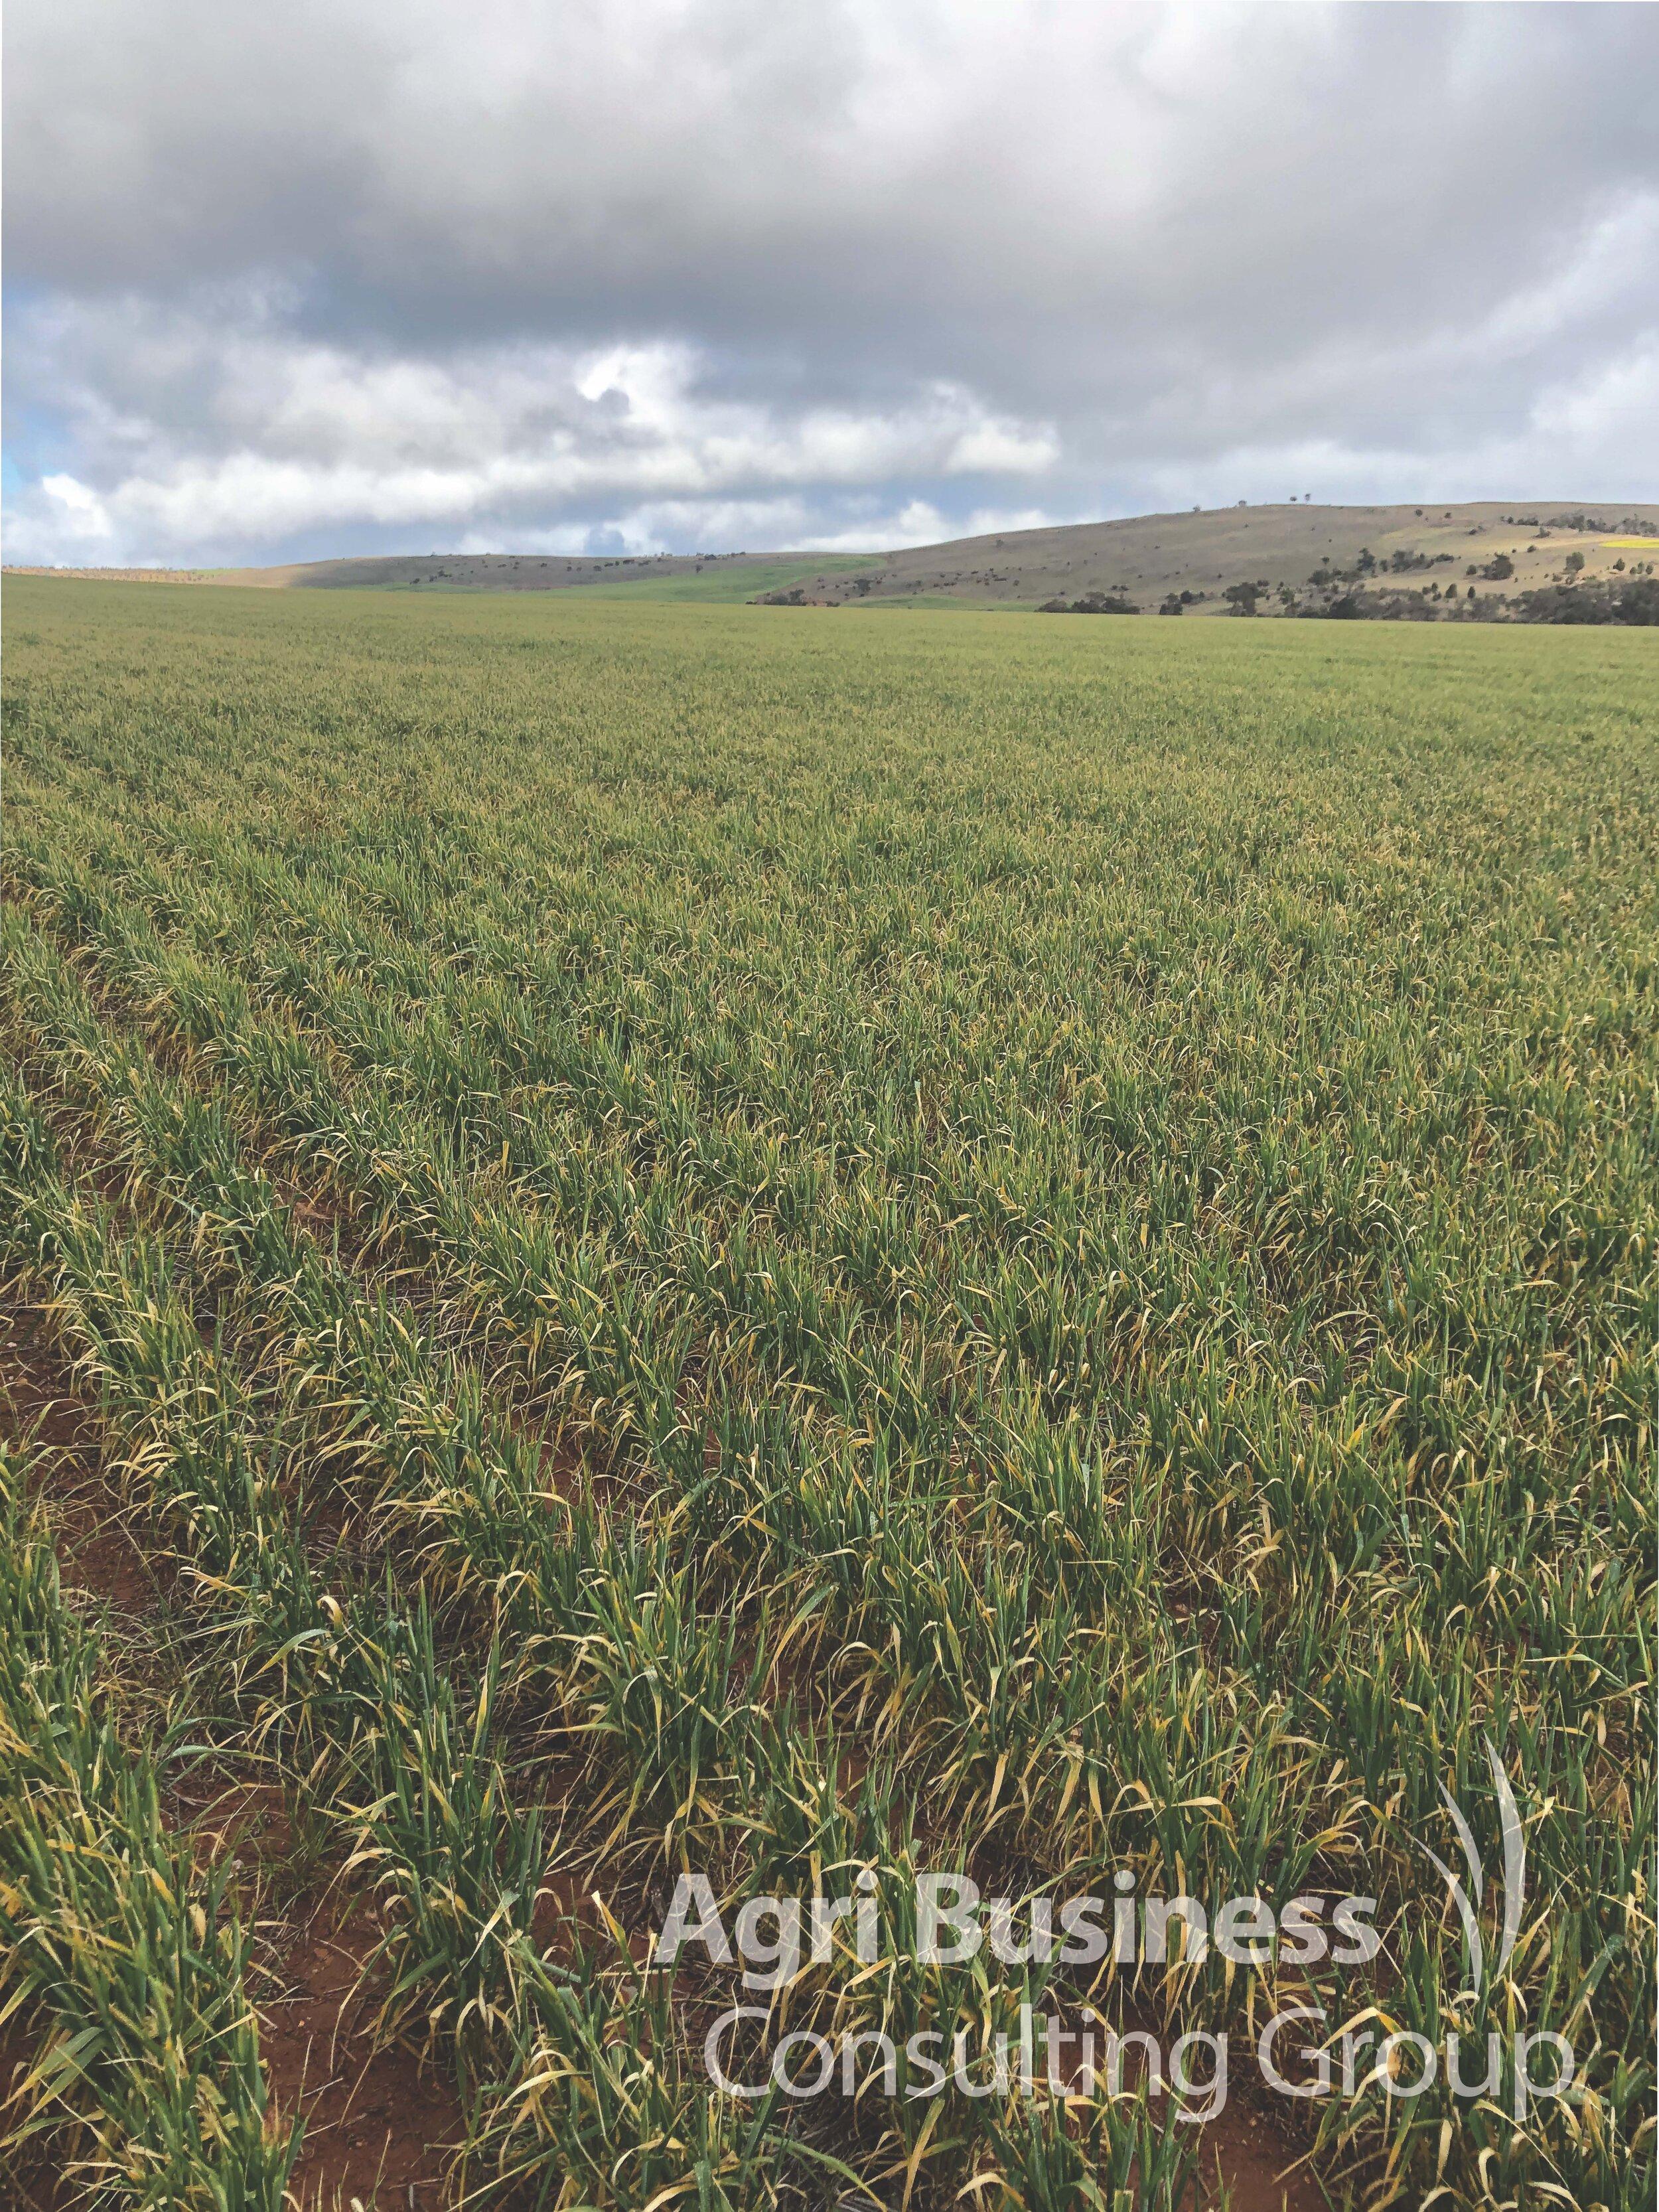 Frost affected Barley crop, October 2019